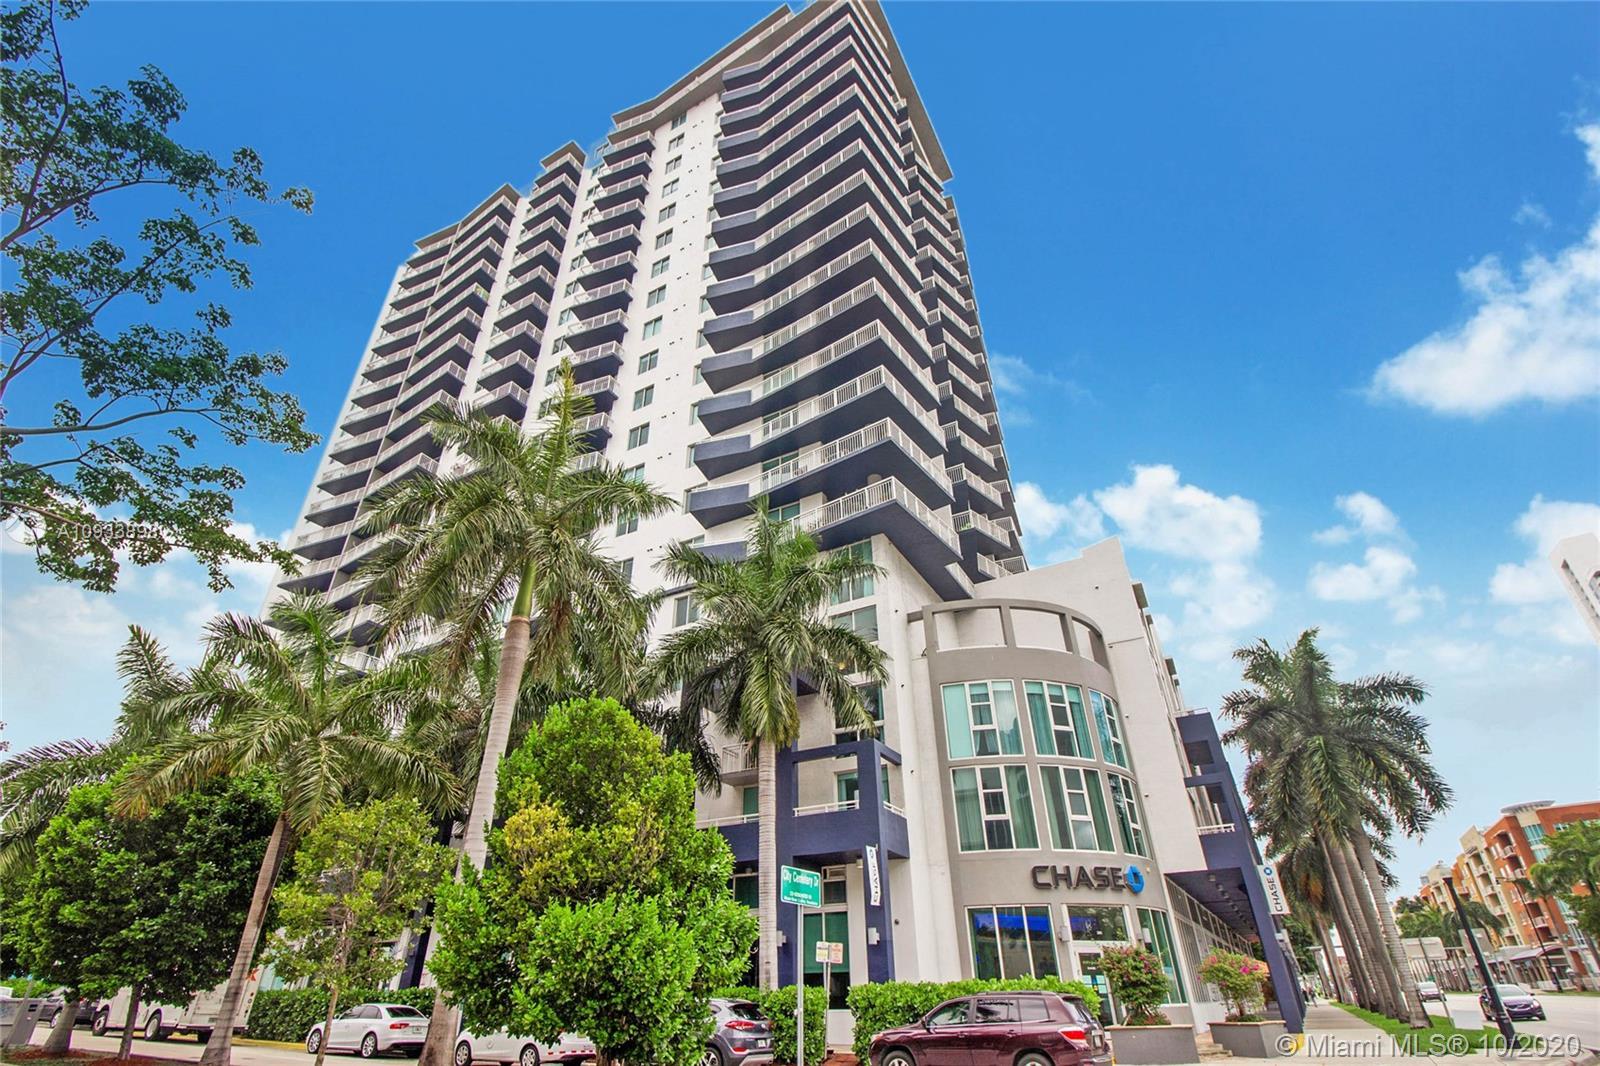 1800 Biscayne Plaza #1207 - 275 NE 18th St #1207, Miami, FL 33132